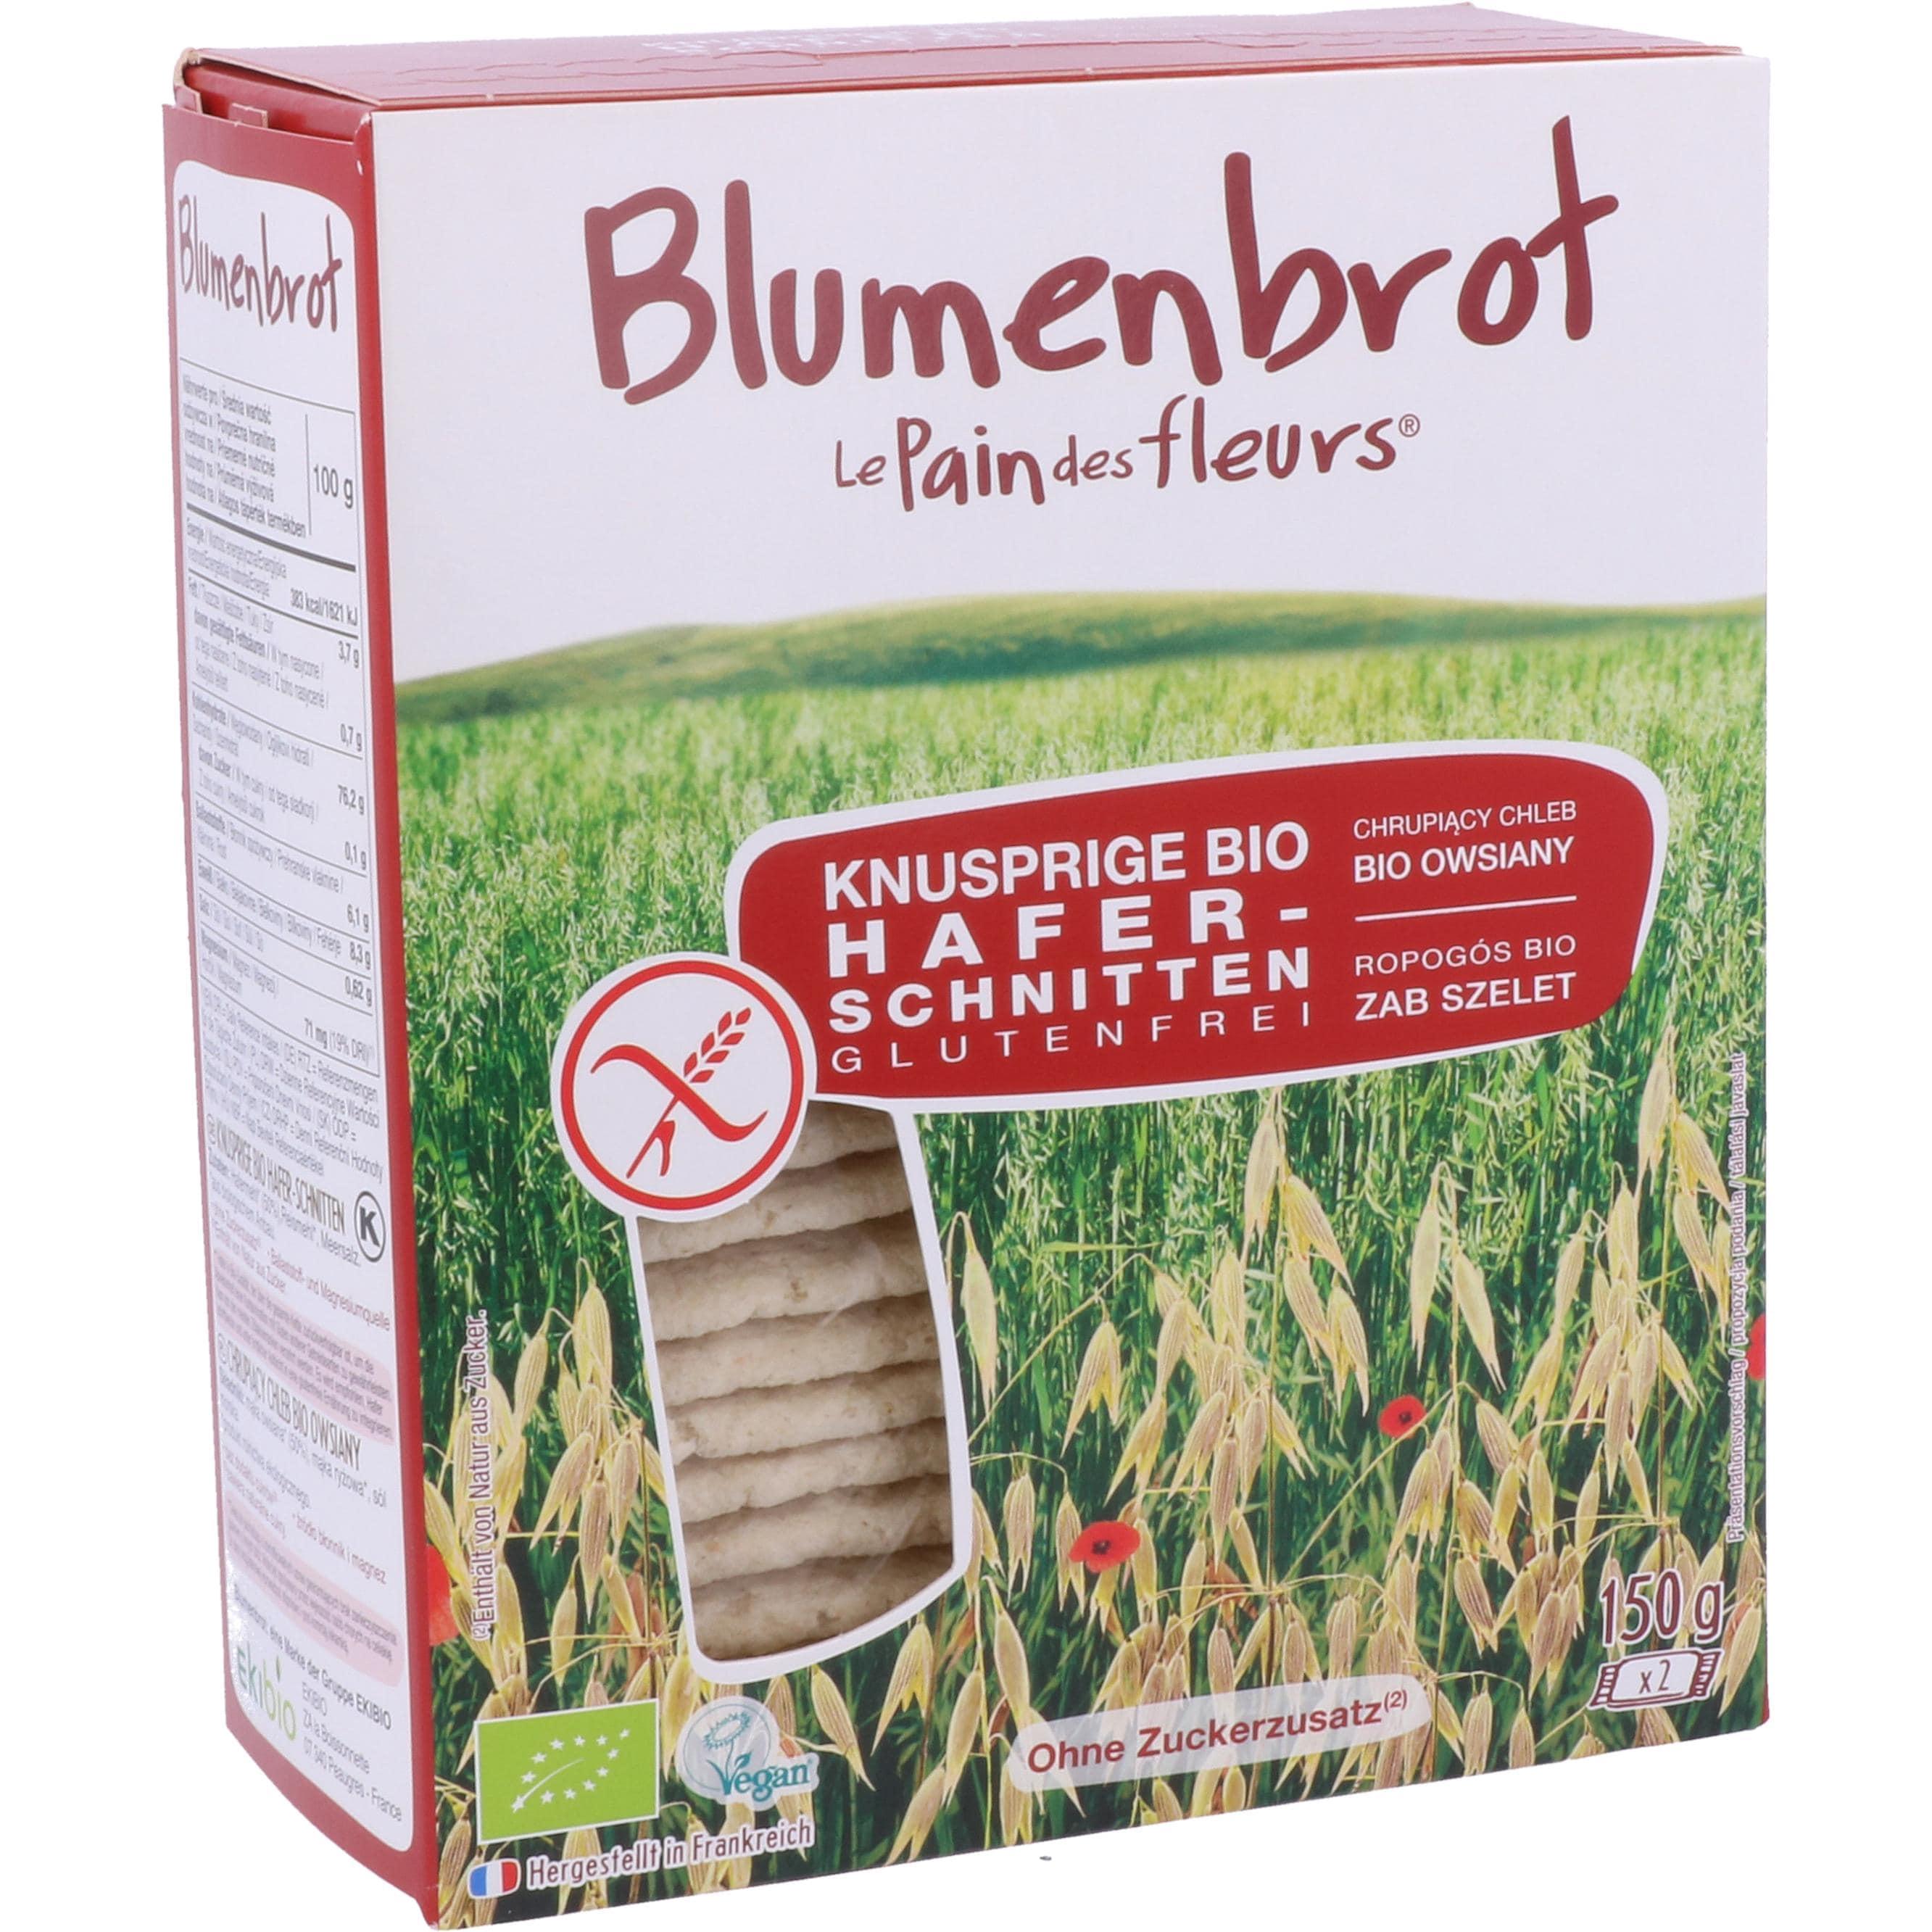 Primeal Bio Blumenbrot Hafer 150g